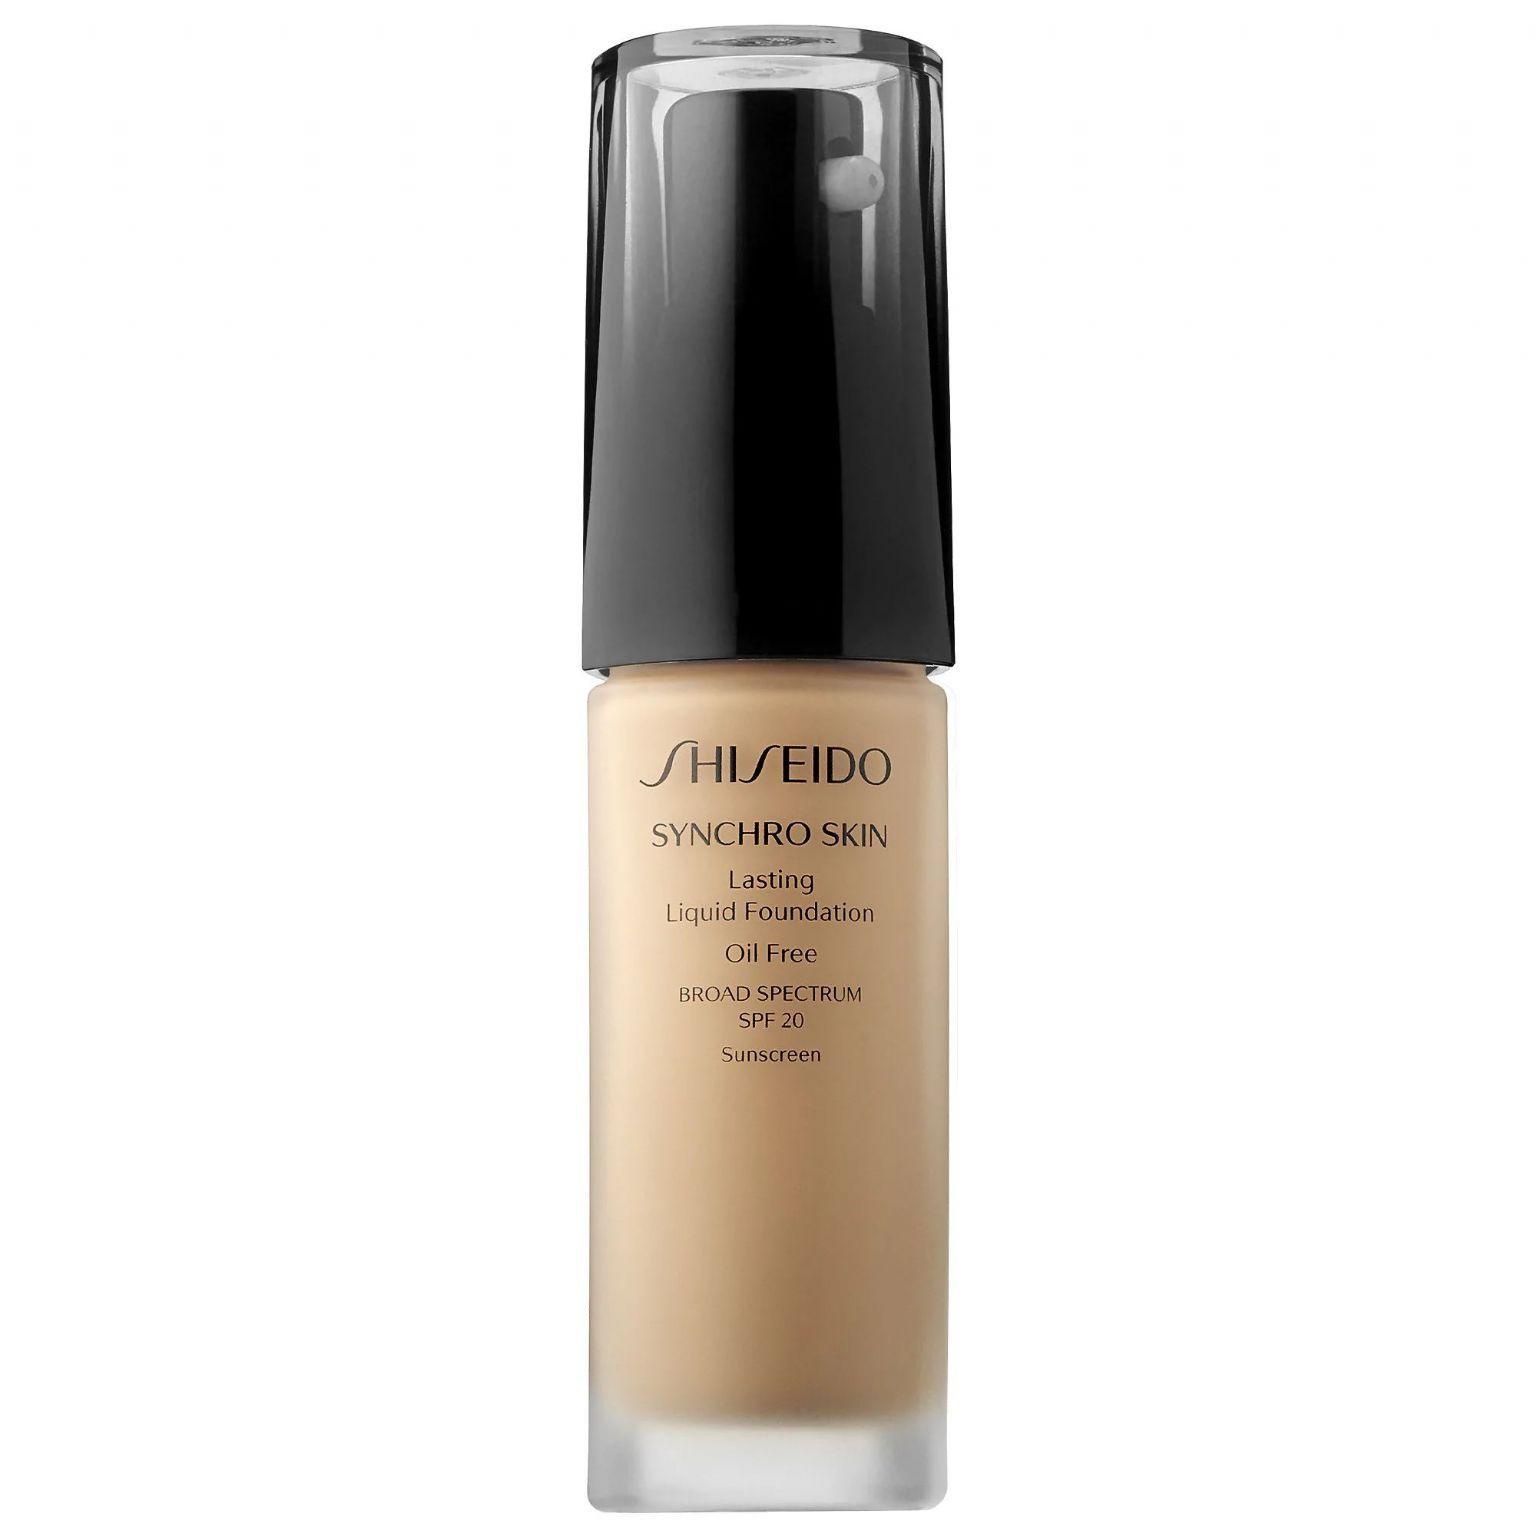 Synchro Skin Lasting Liquid Oil-Free Foundation